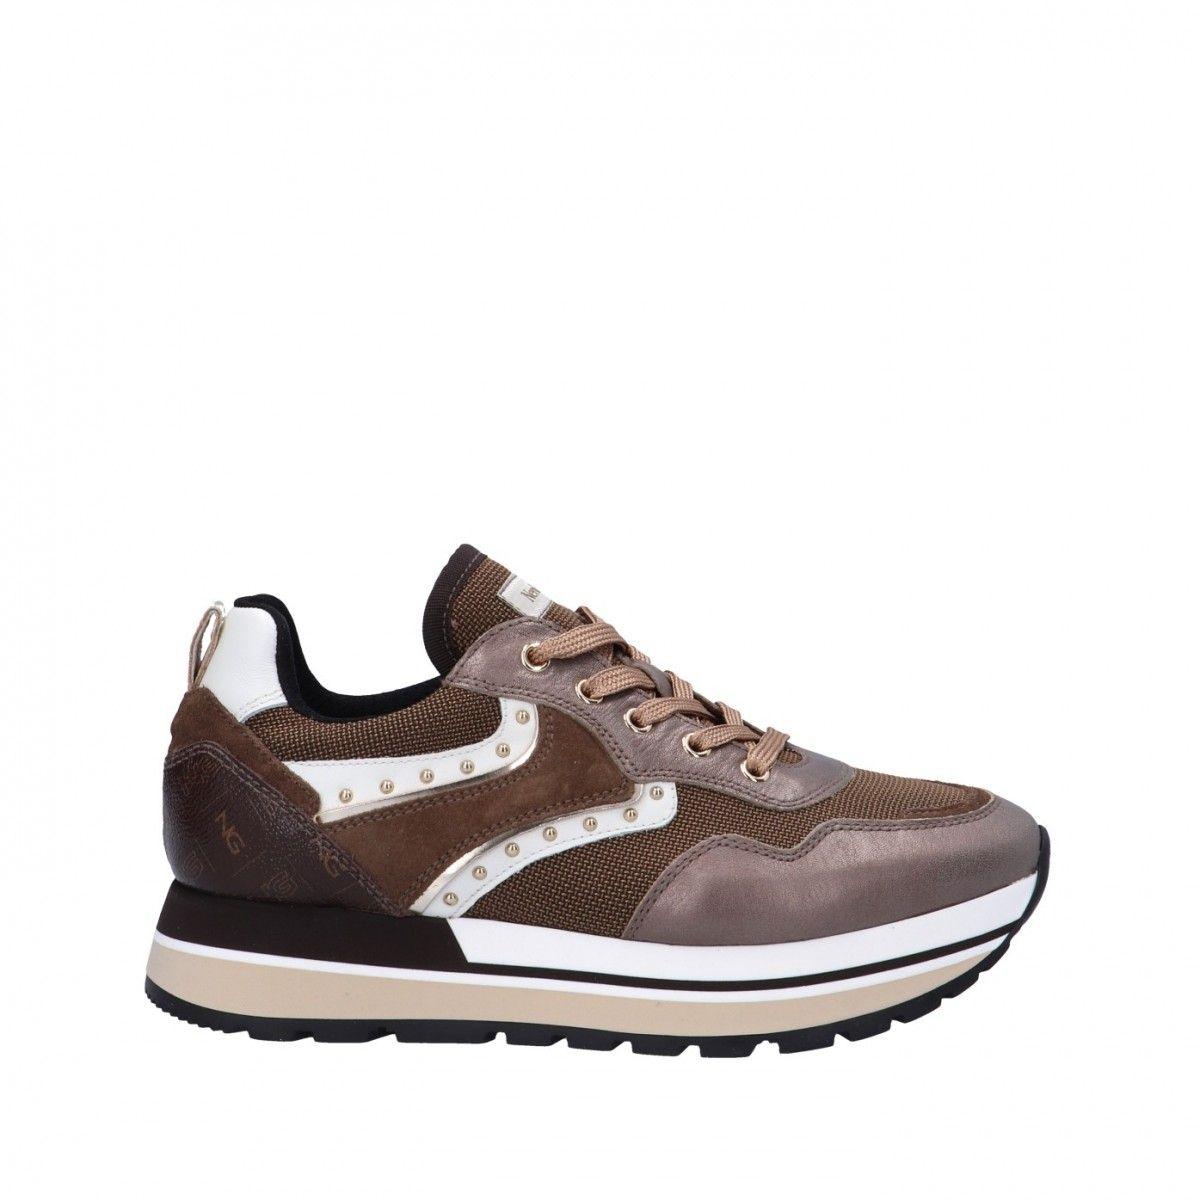 Nerogiardini Sneaker...